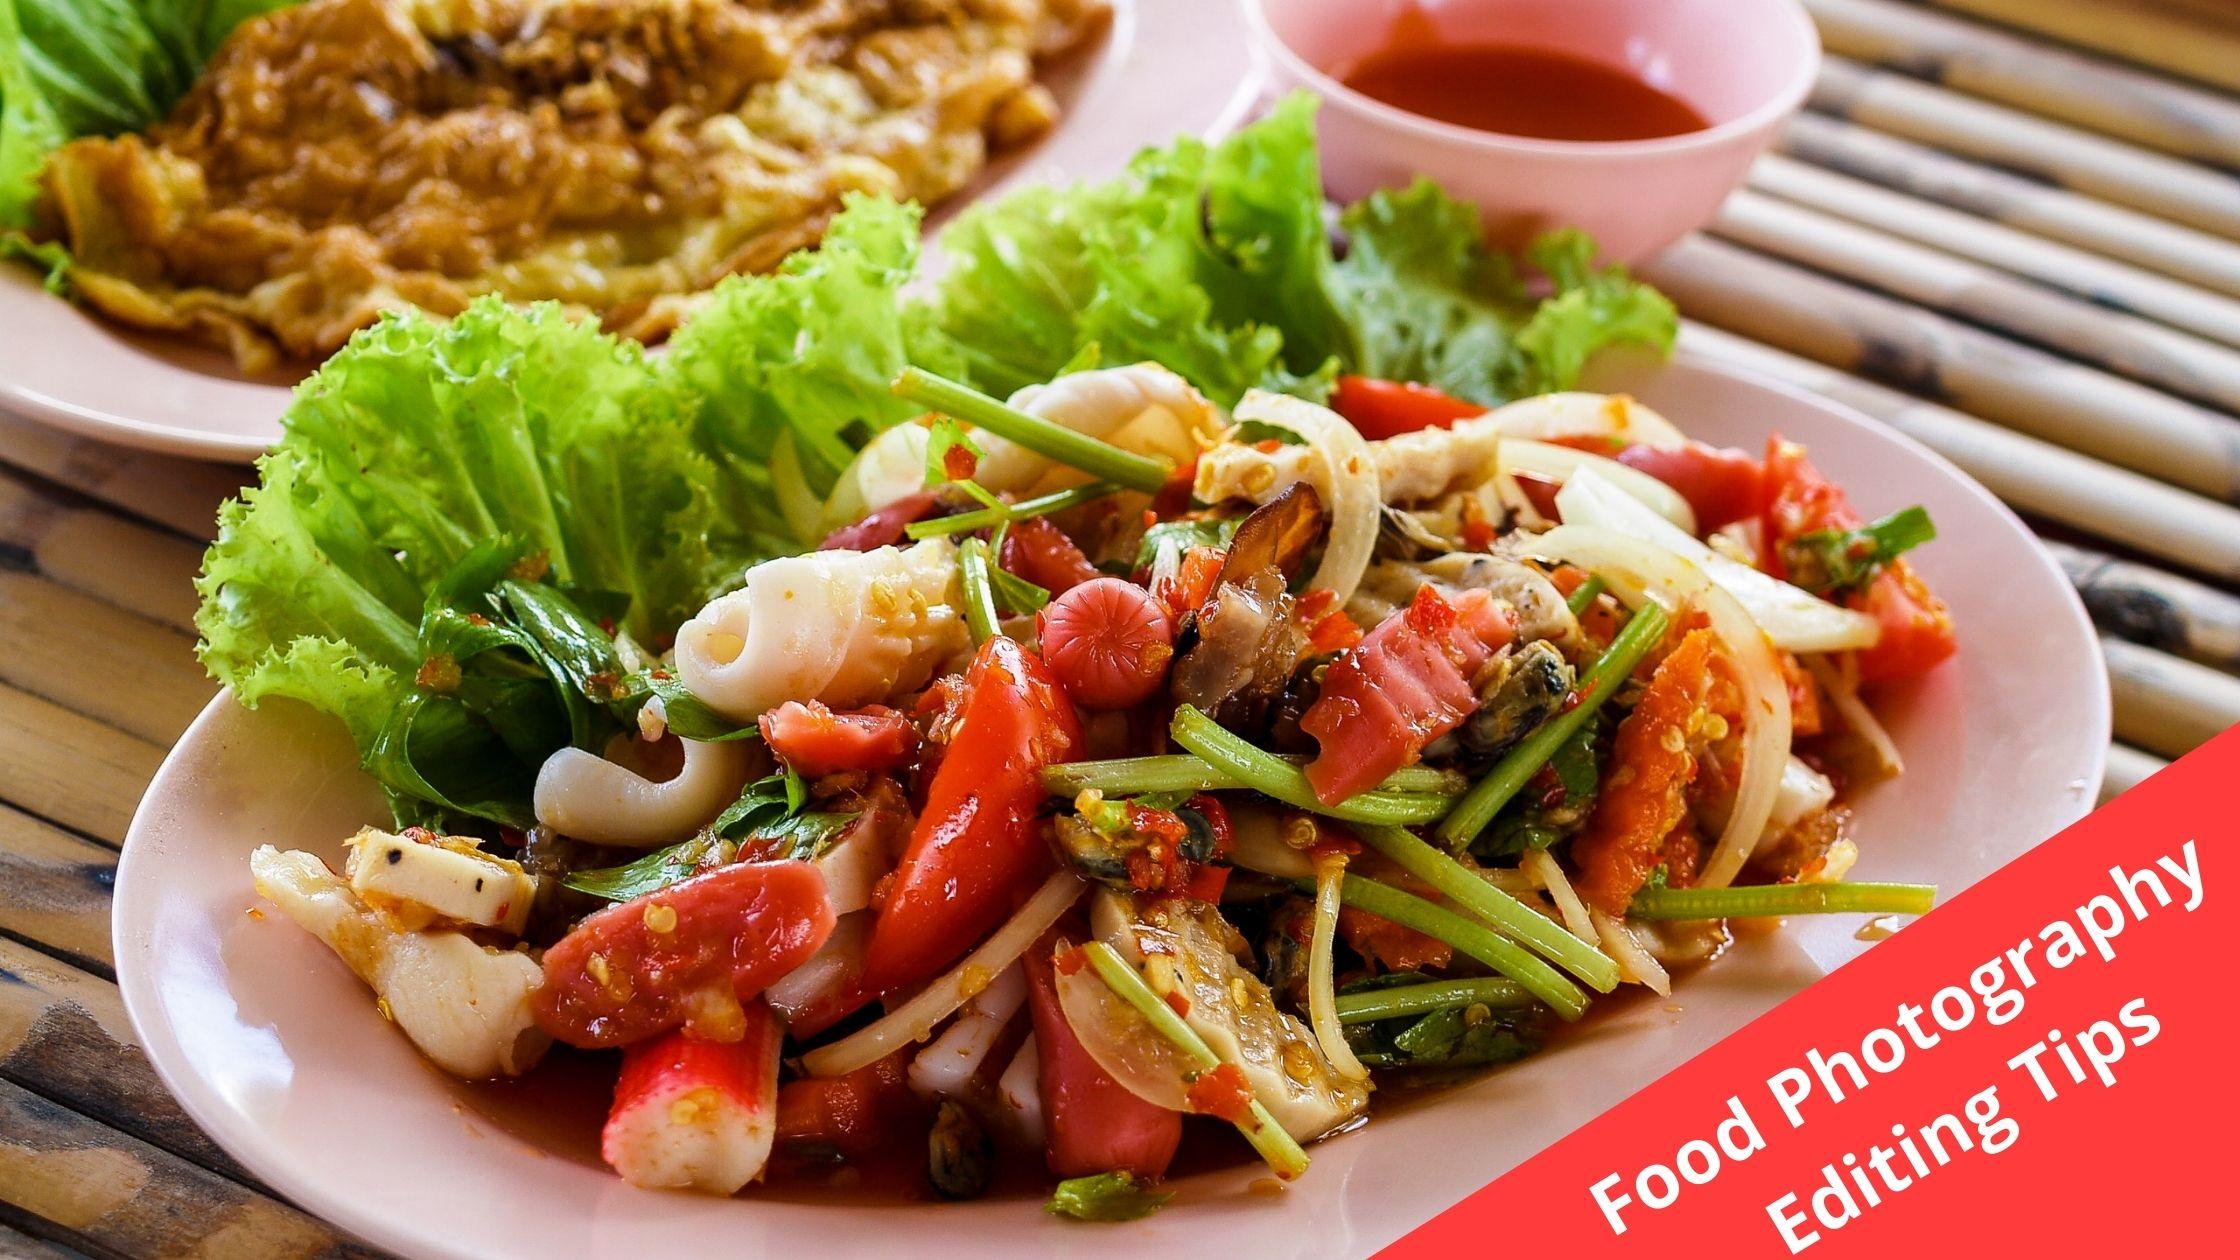 Food Photography Editing Tips